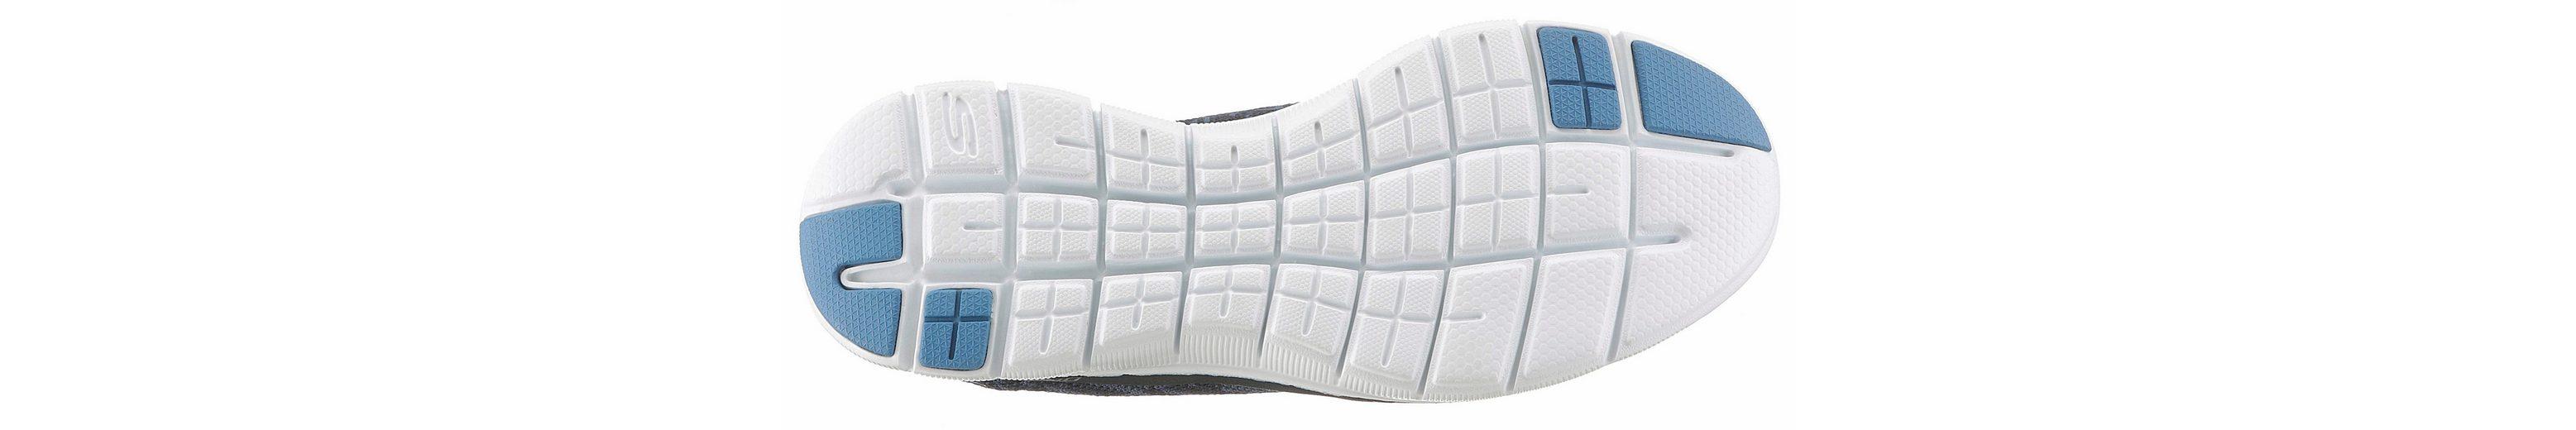 Skechers Flex Appeal 2.0 Insights Slipper, mit Air-Cooled Memory Foam